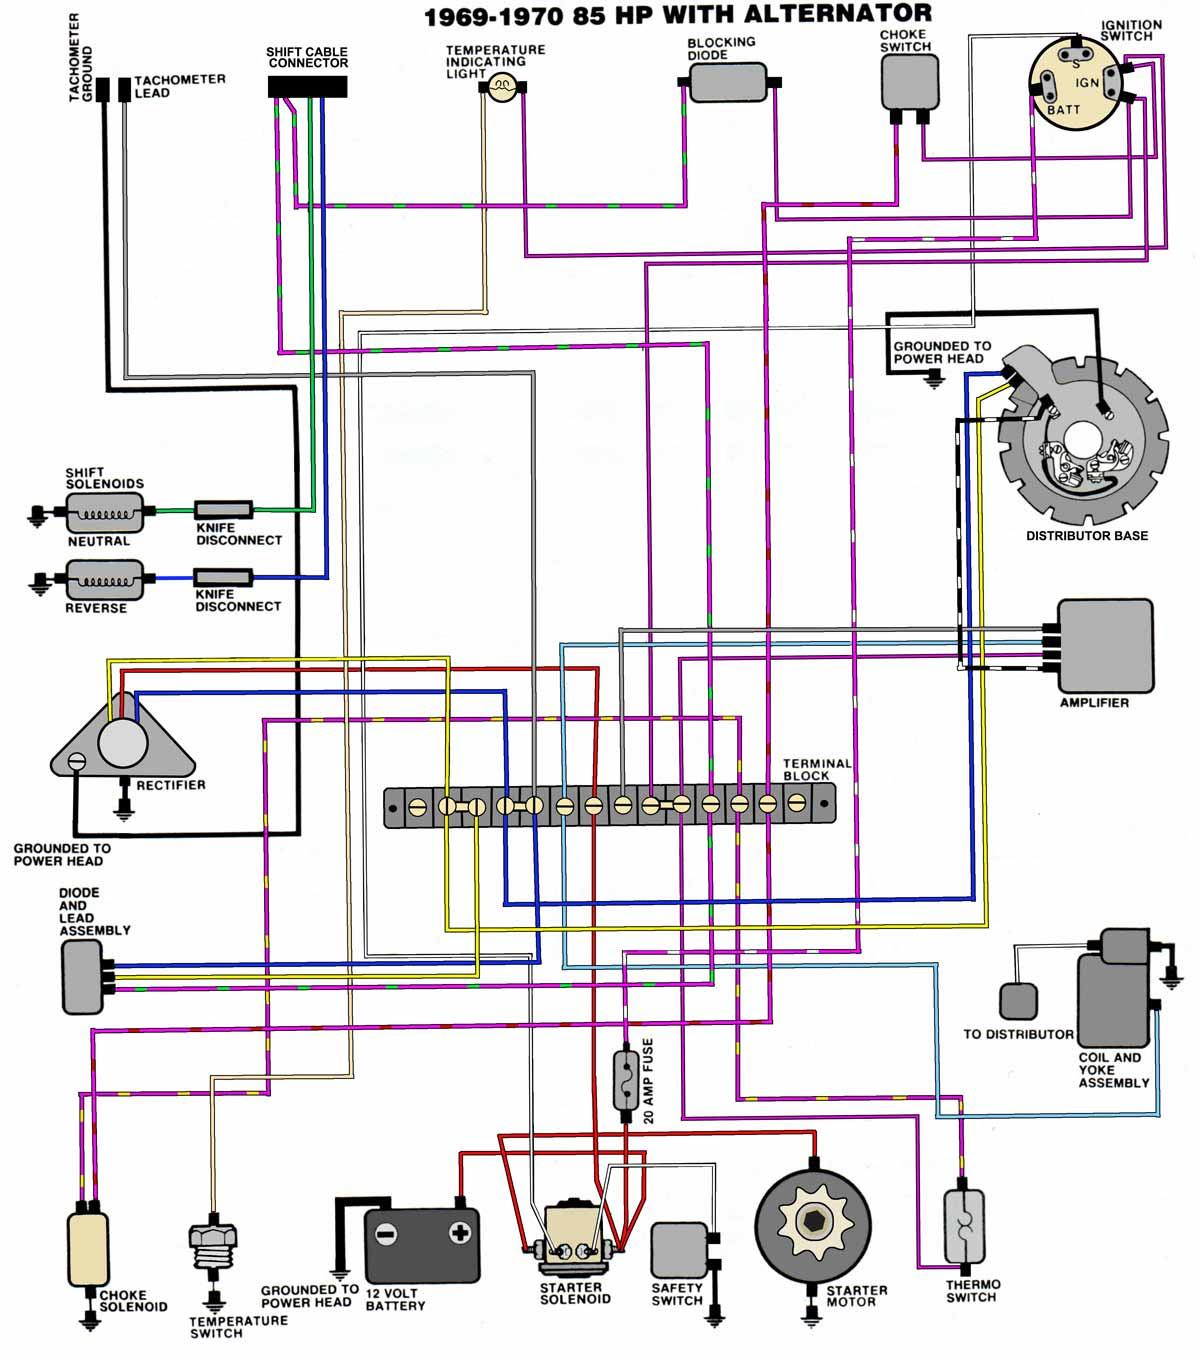 Evinrude 150 Wiring Diagram - Wiring Diagram & Schemas